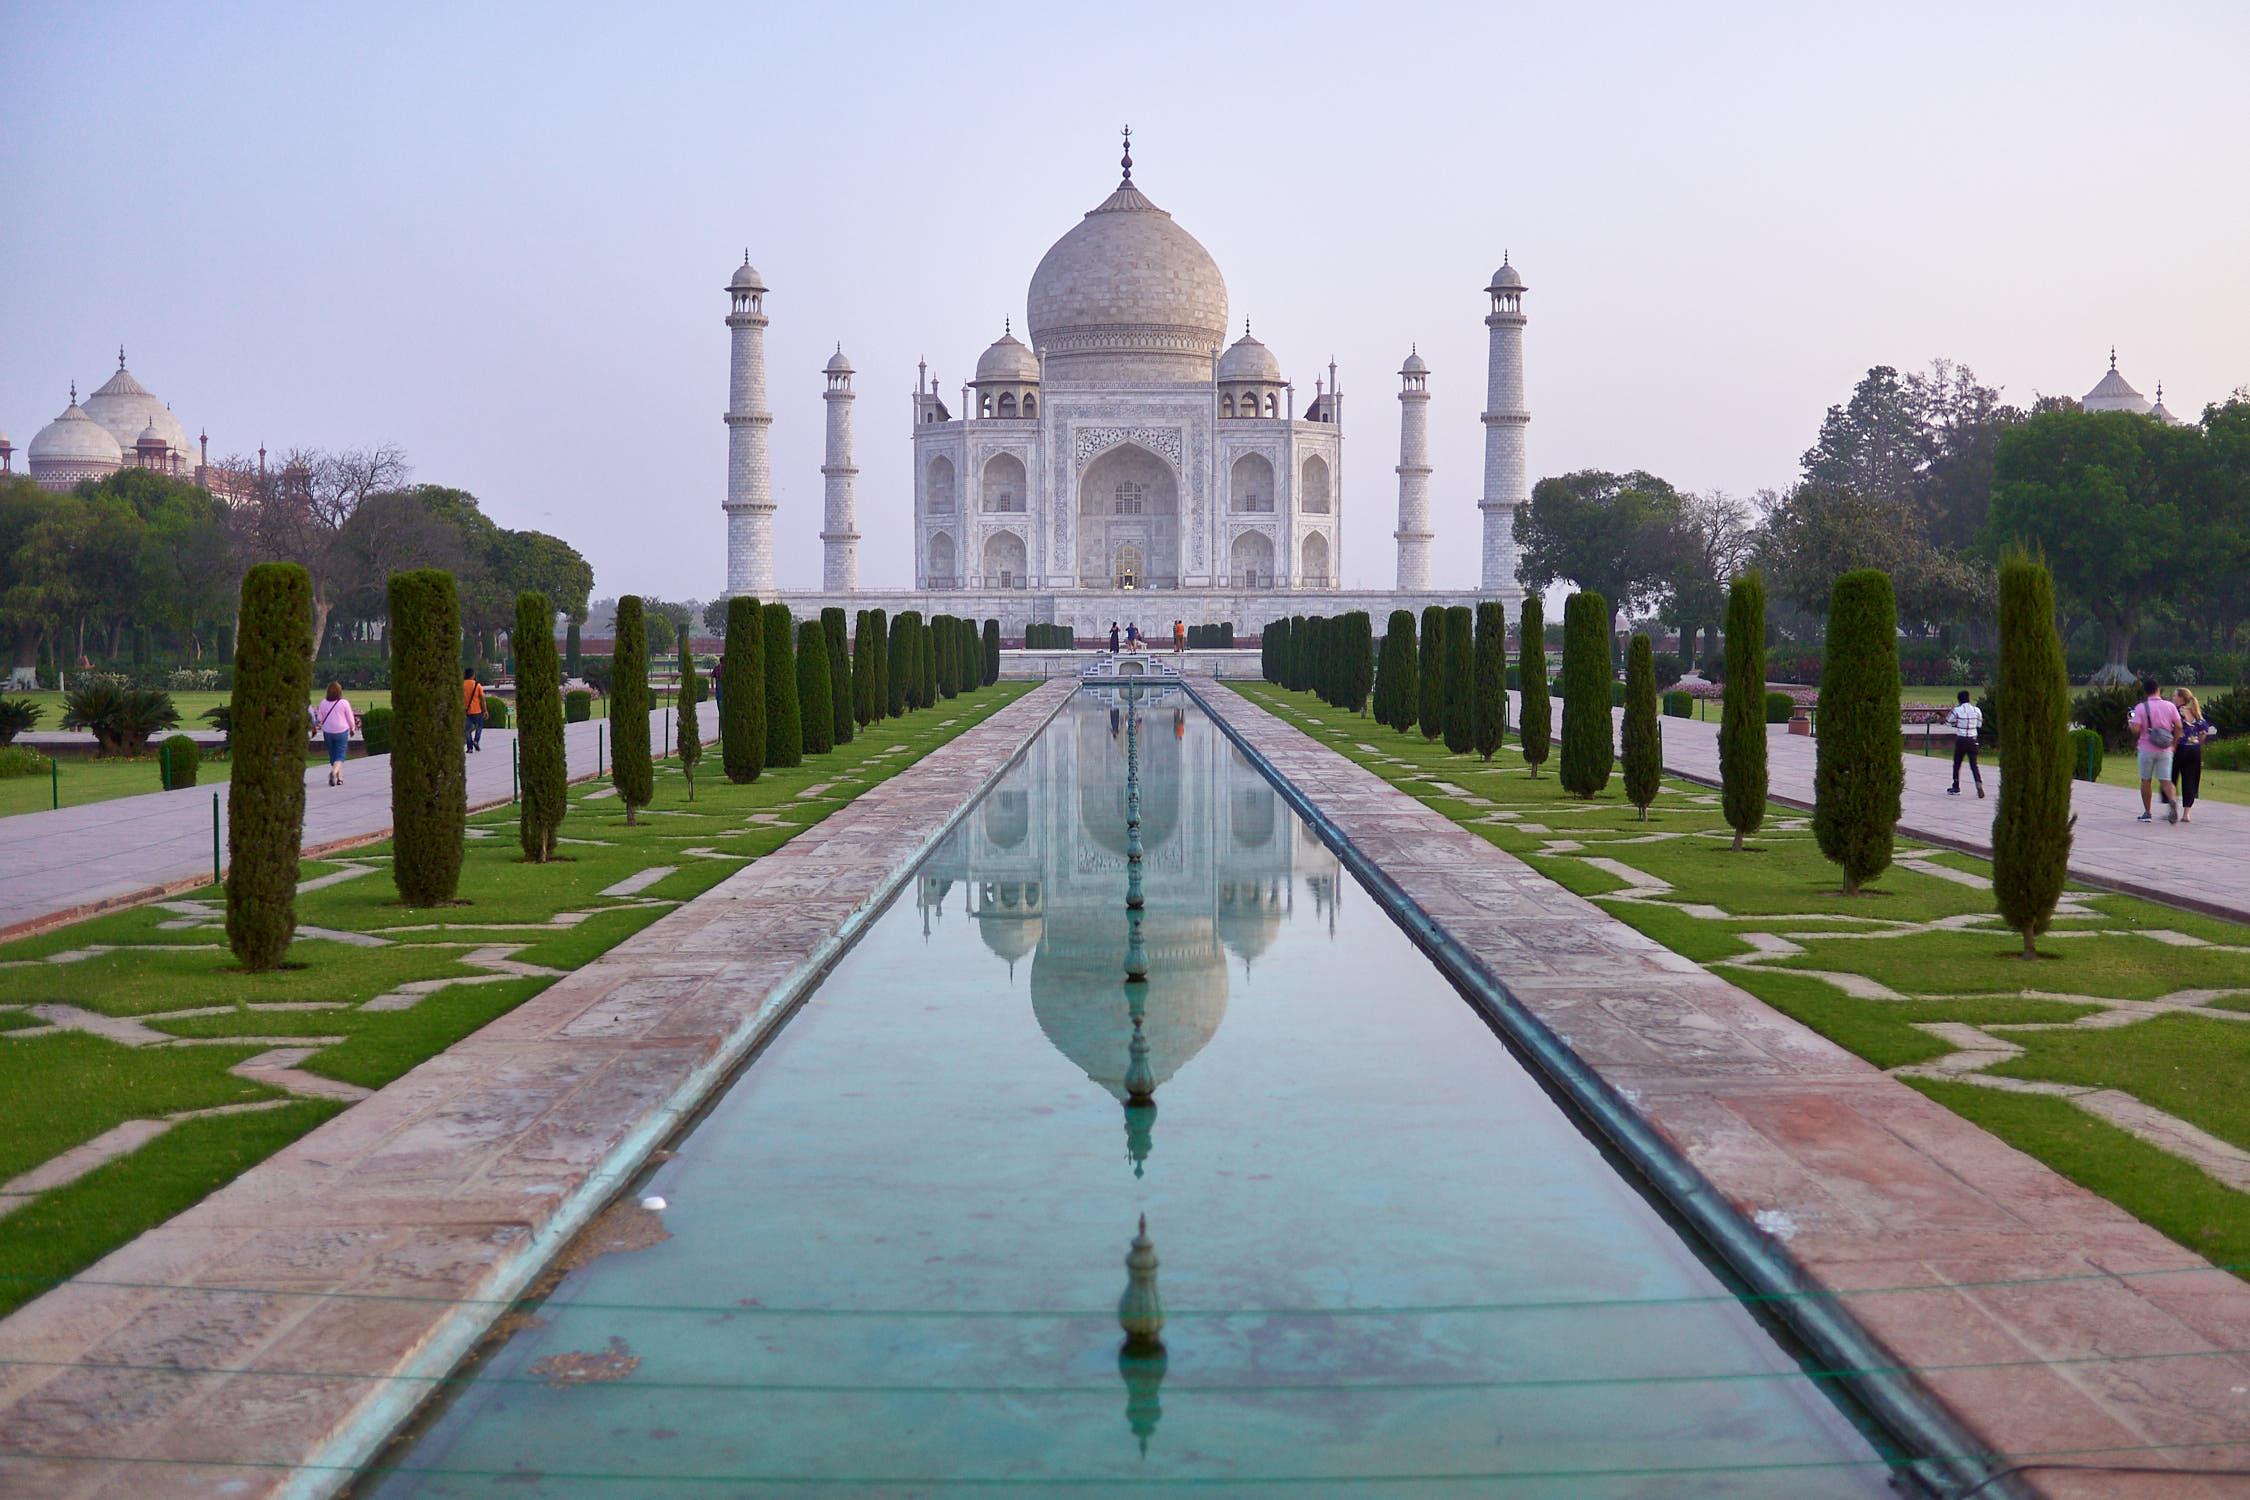 The perfect shot of Taj Mahal, India